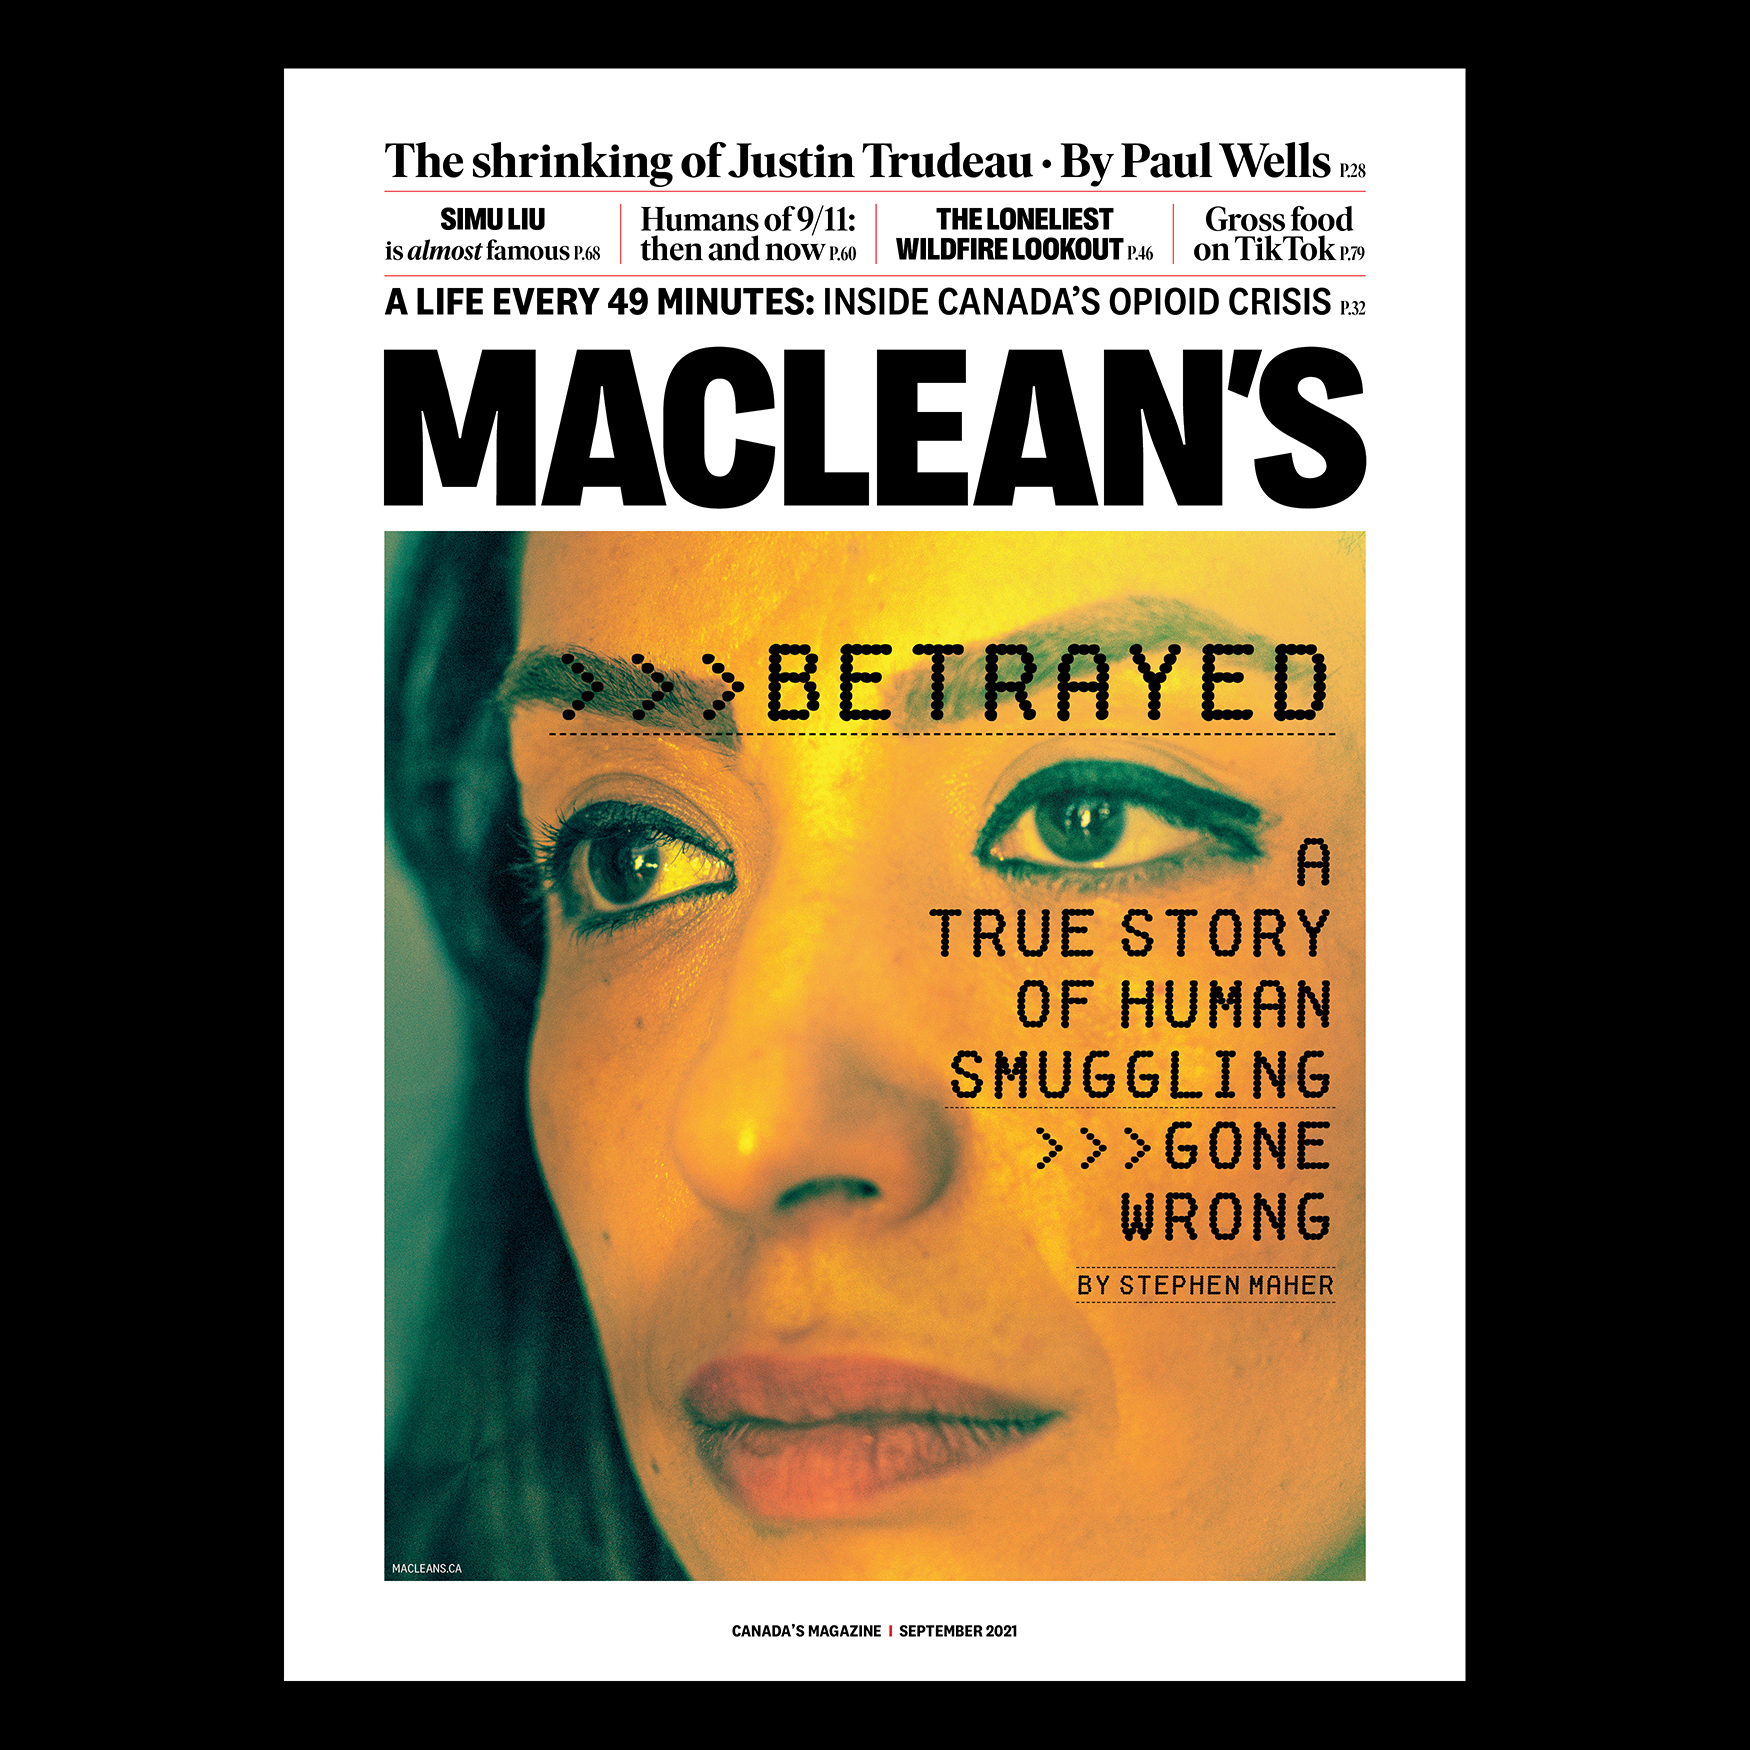 Maclean's September 2021 Cover